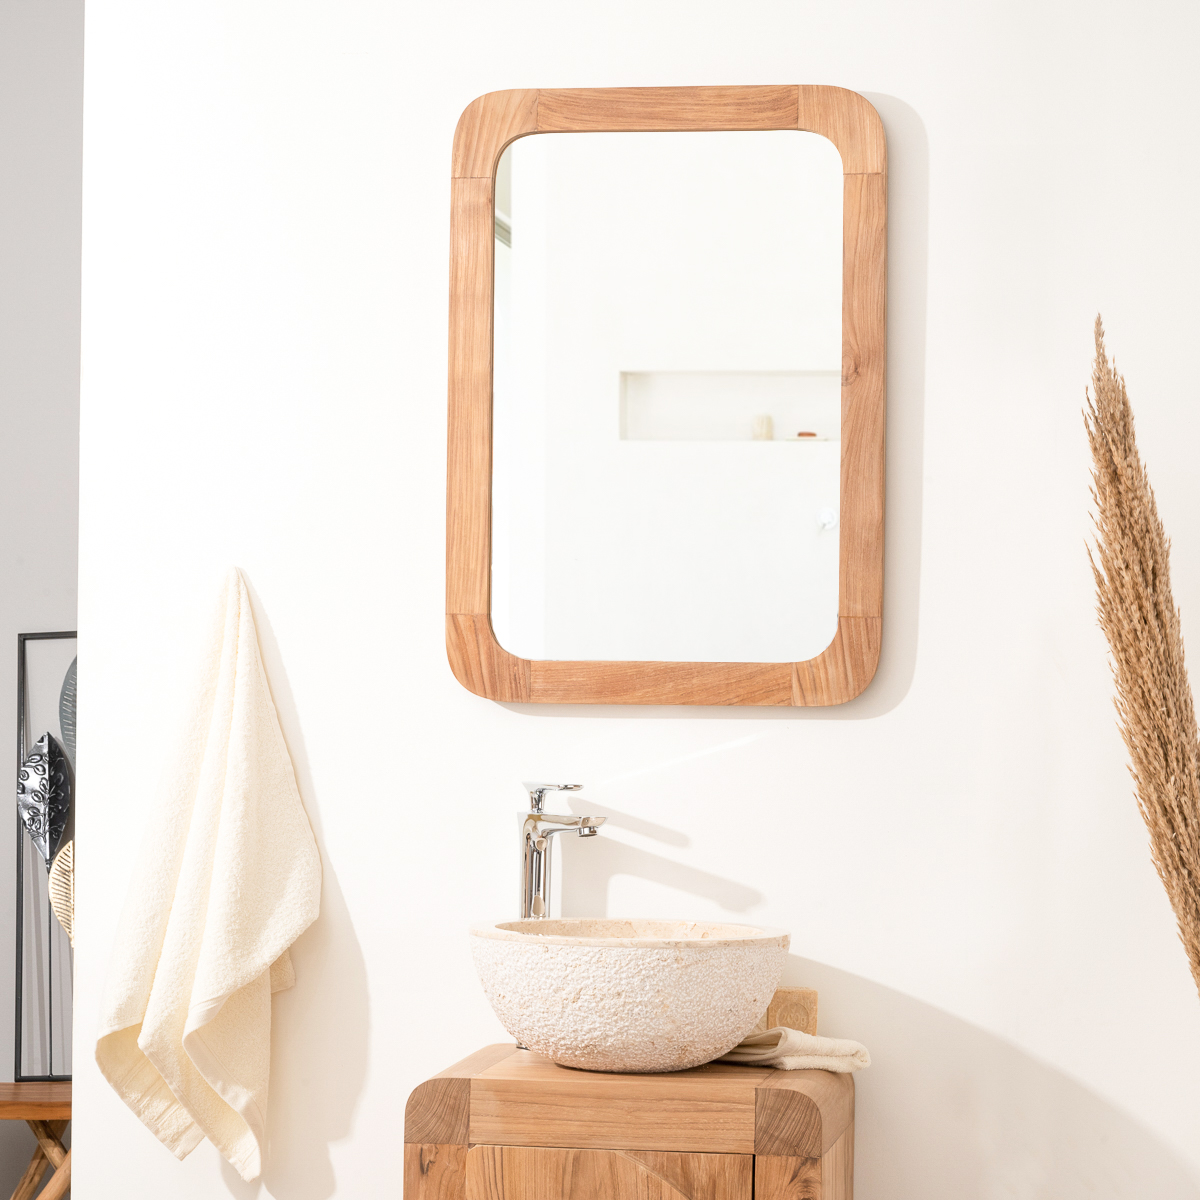 Miroir r tro en teck massif 70 cm x 50cm - Miroir teck salle de bain ...